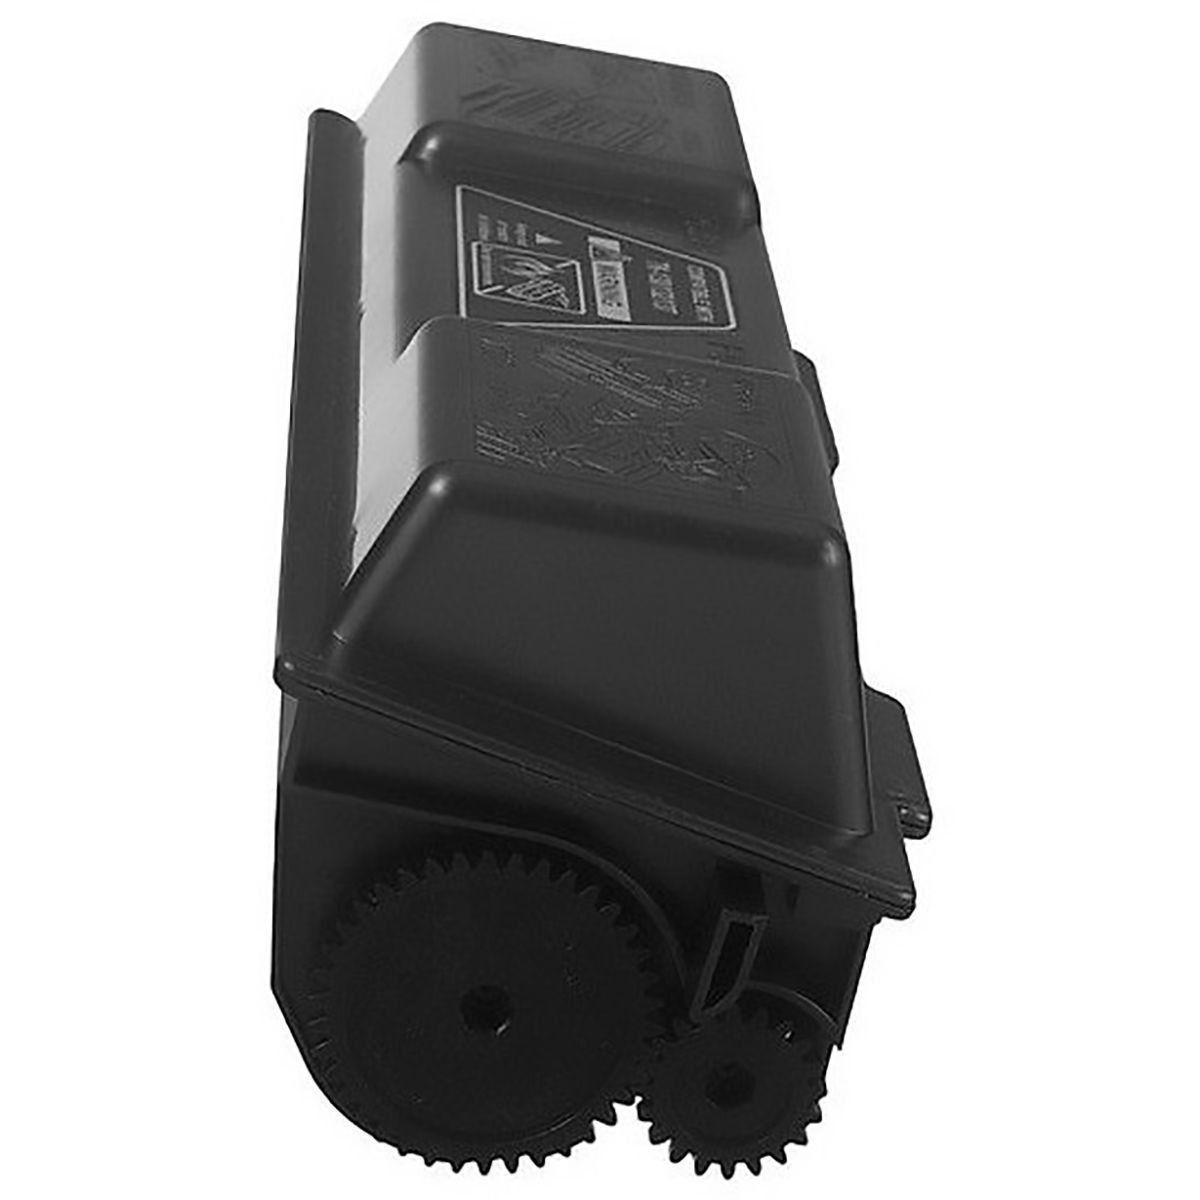 Compatível: Toner TK170 TK172 para Kyocera FS1320 FS1320d FS1320dn FS1370 FS1370dn FS-1320dn 1370dn / Preto / 7.200